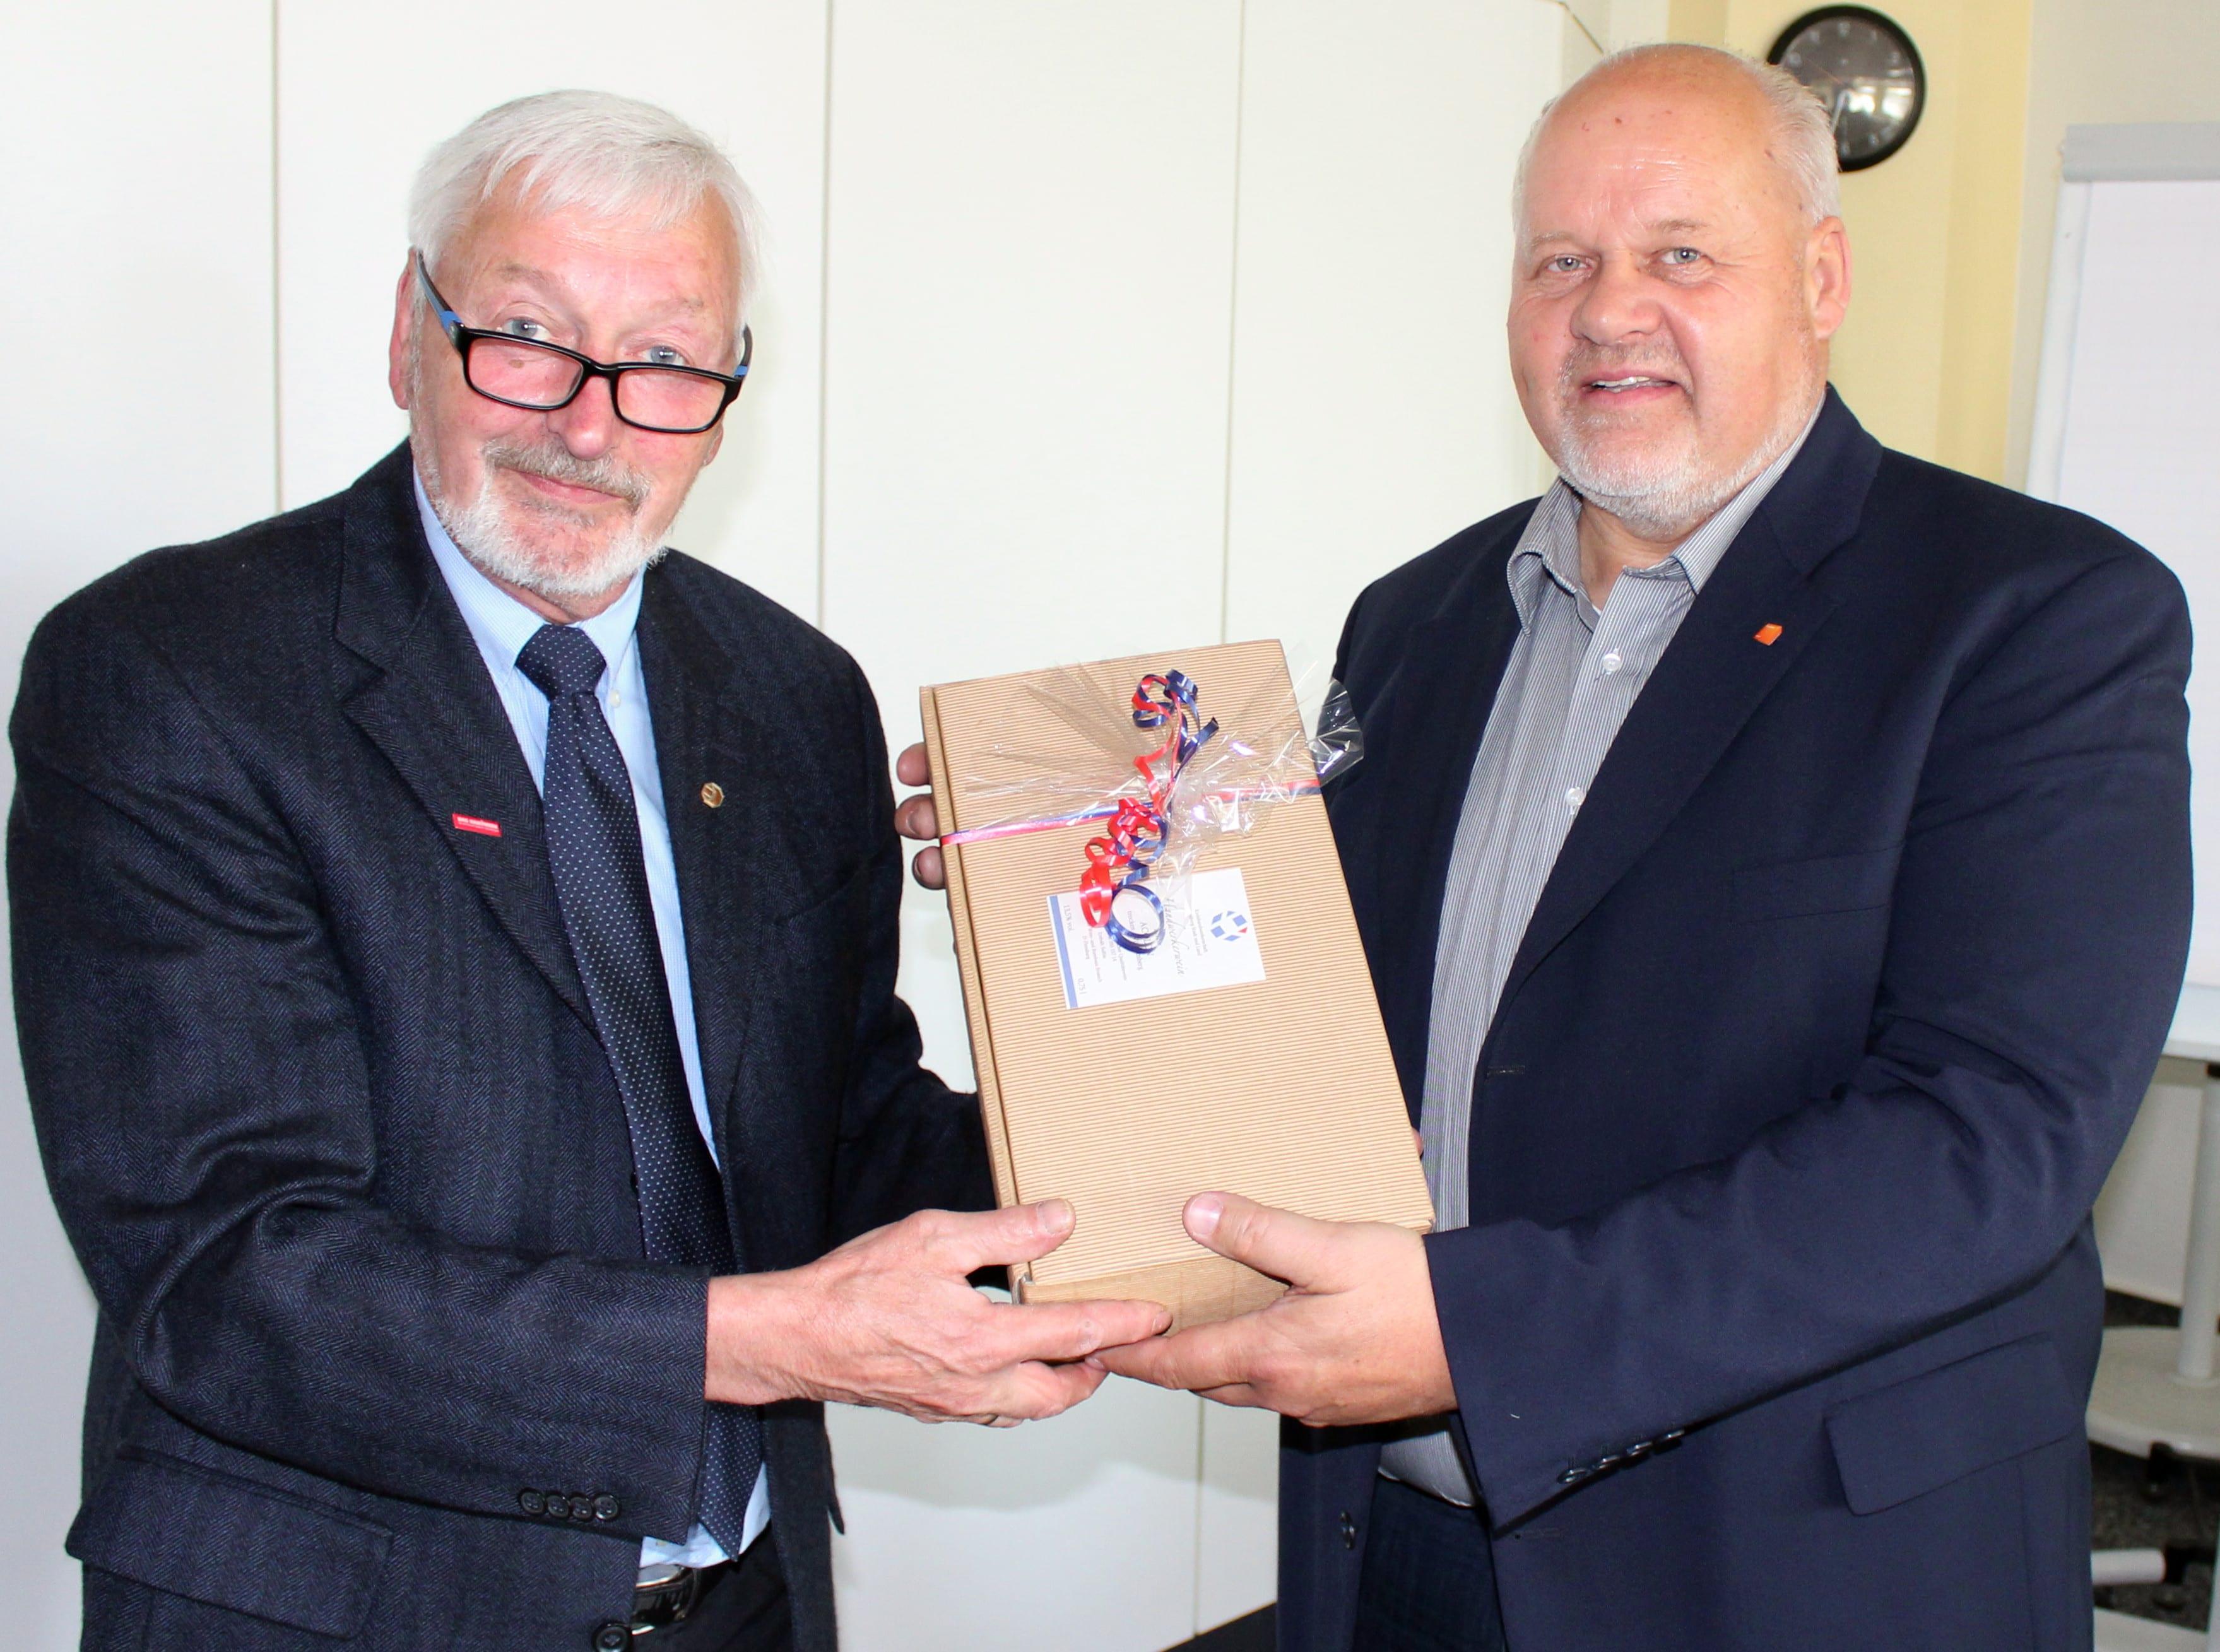 Kreishandwerkerschaft Flensburg BU1OMT April 2019